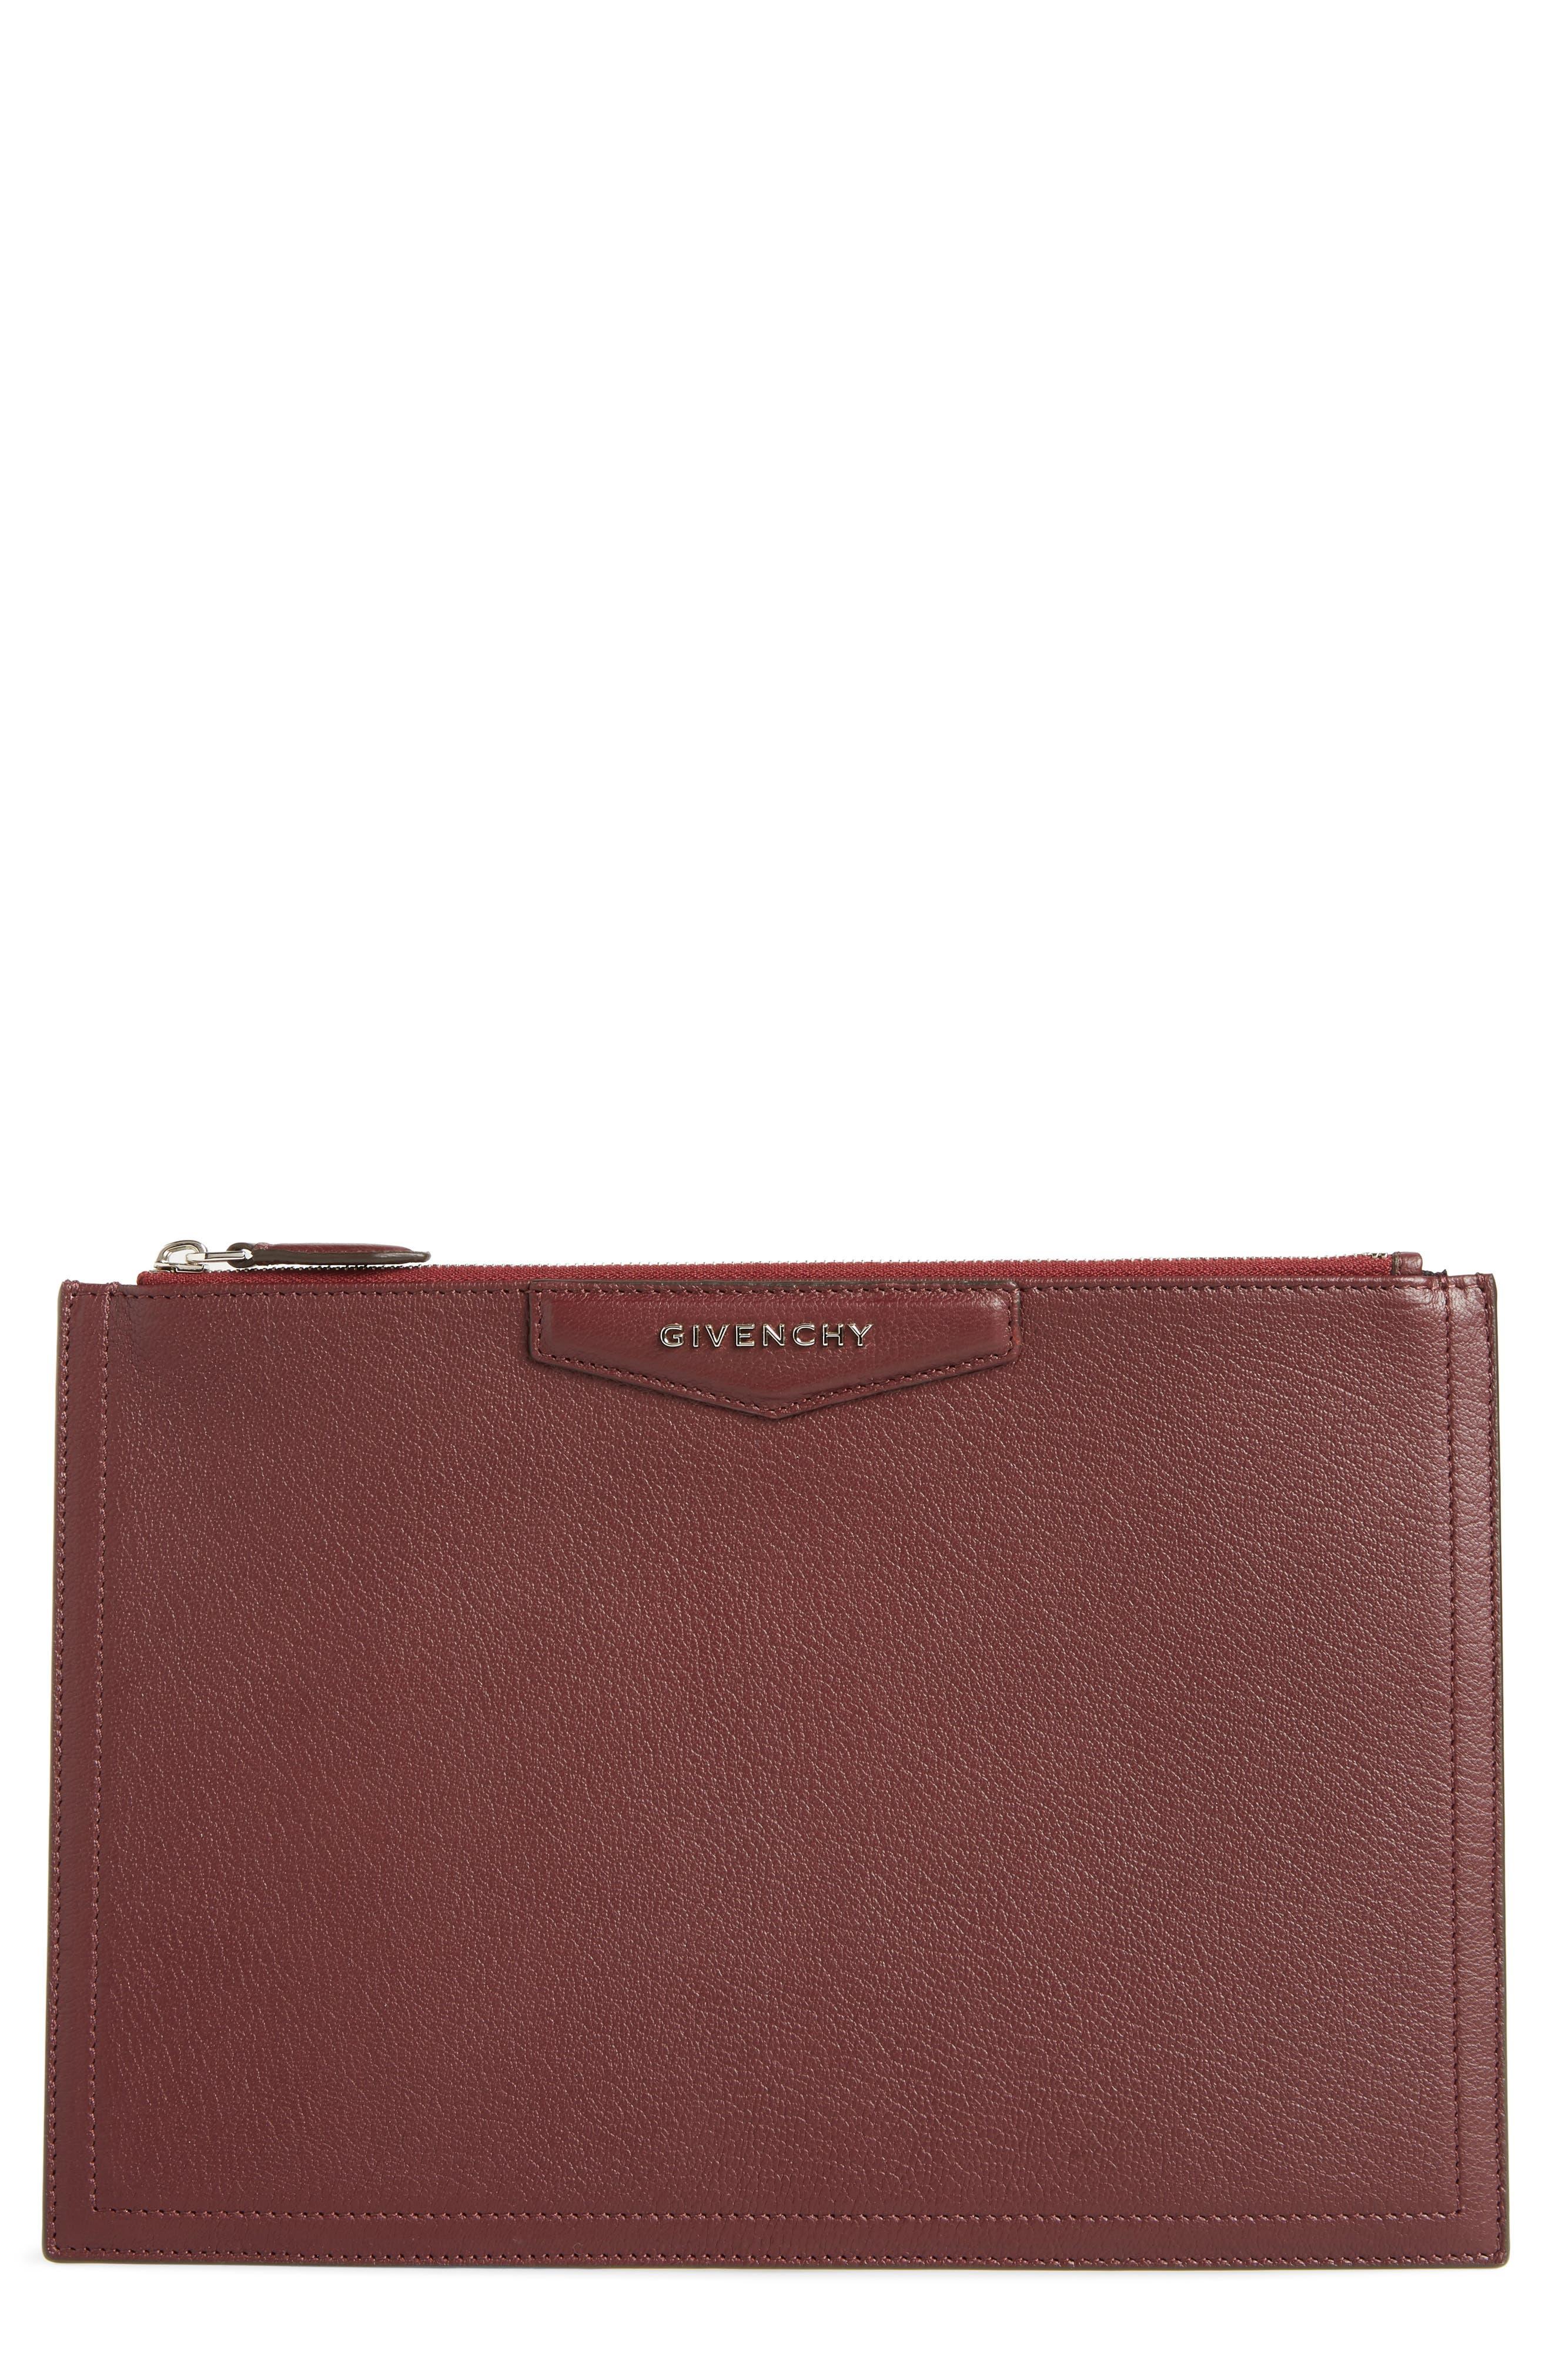 Medium Antigona Leather Pouch,                             Main thumbnail 1, color,                             AUBERGINE